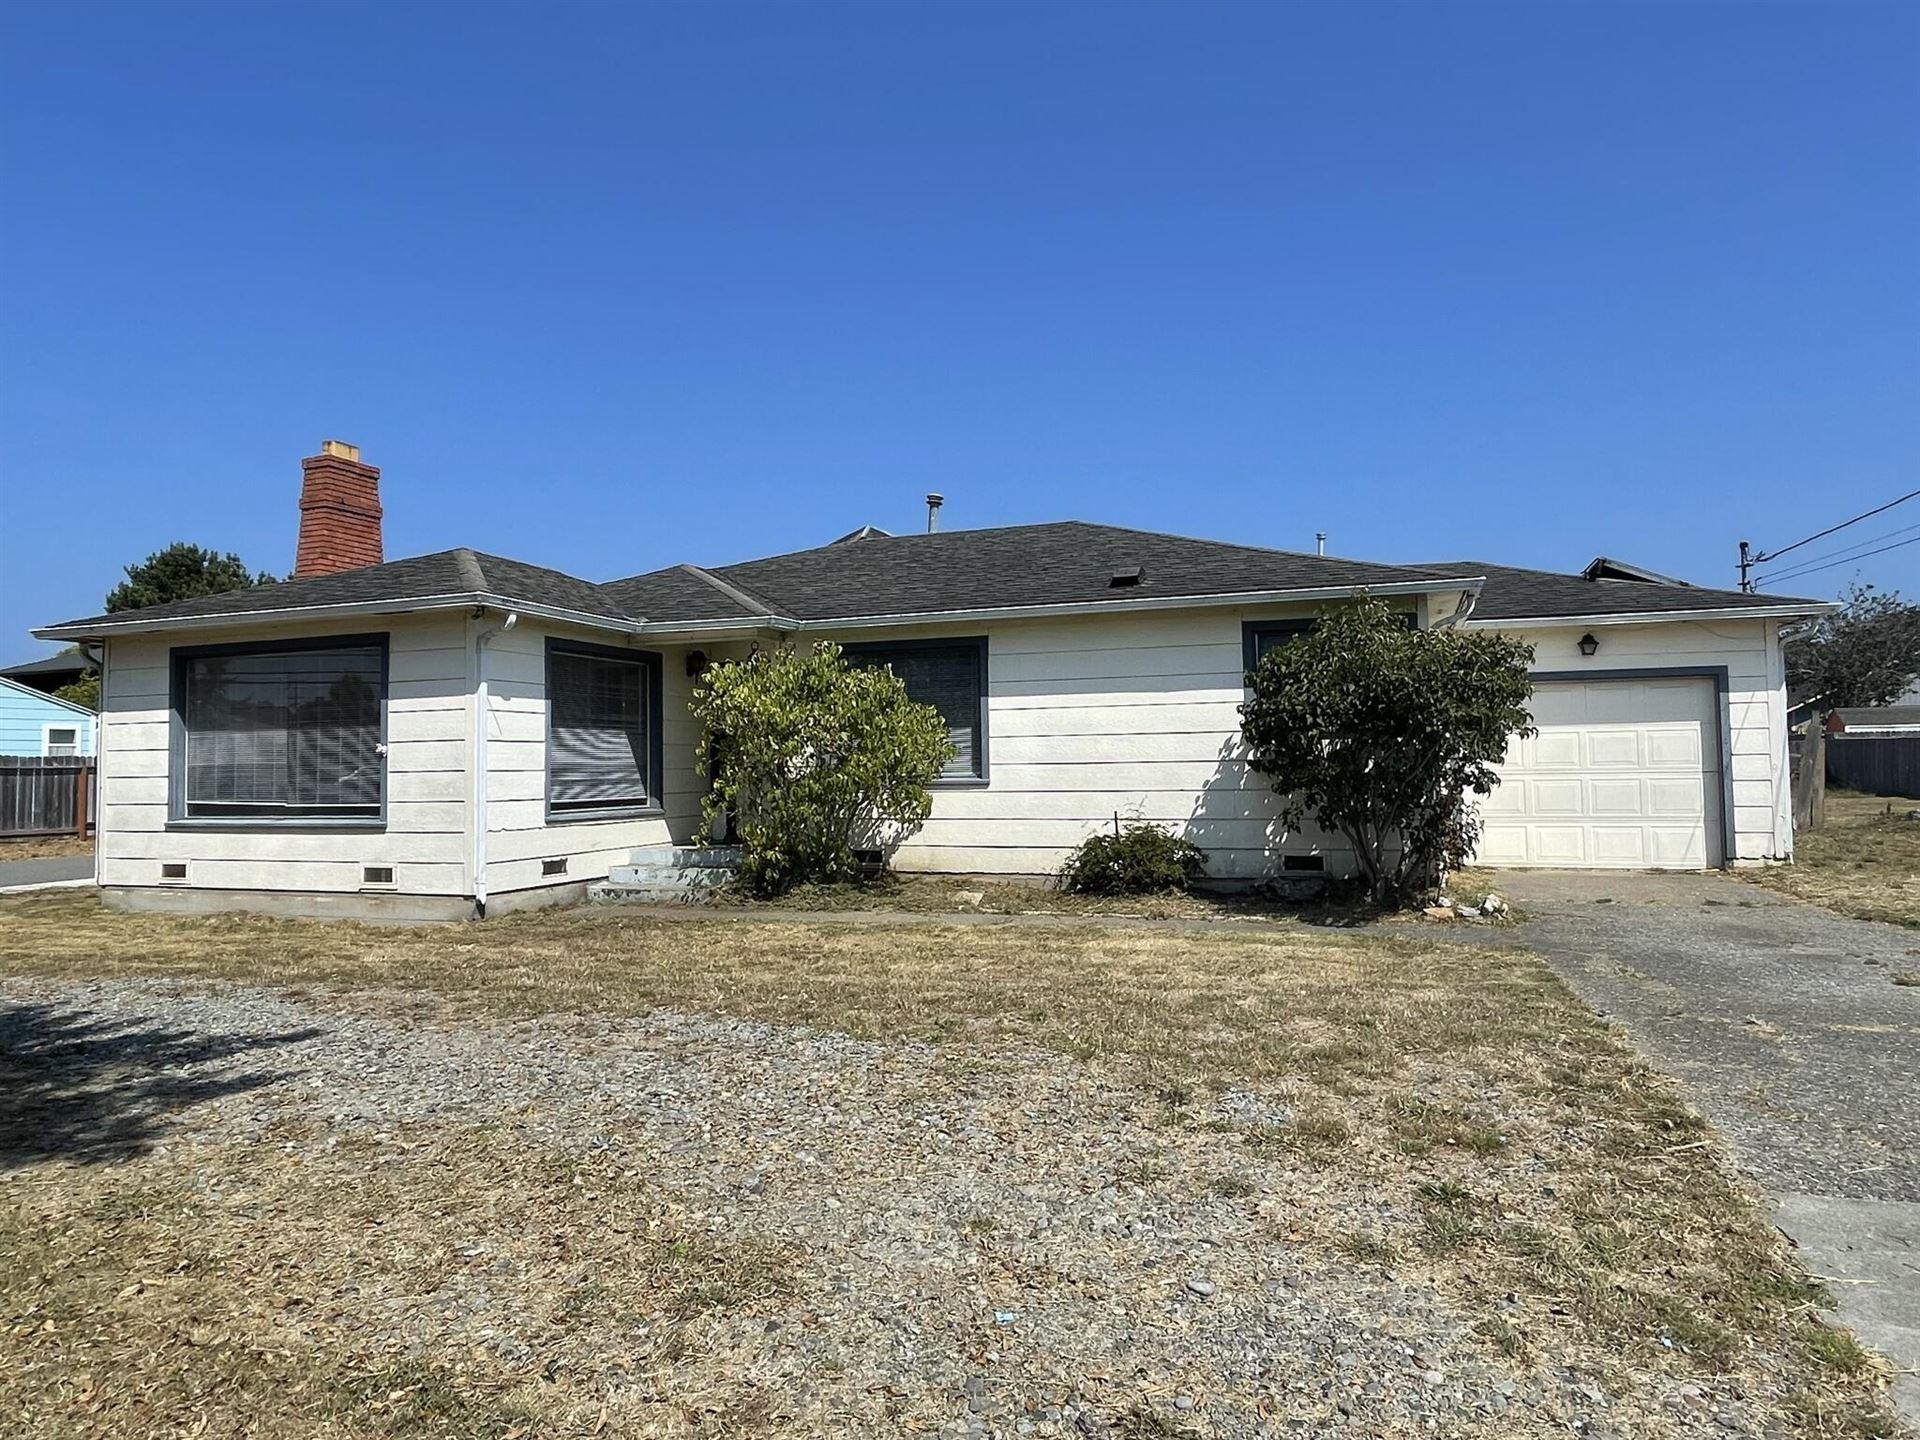 2241 Mckinleyville Avenue, McKinleyville, CA 95519 - MLS#: 259947